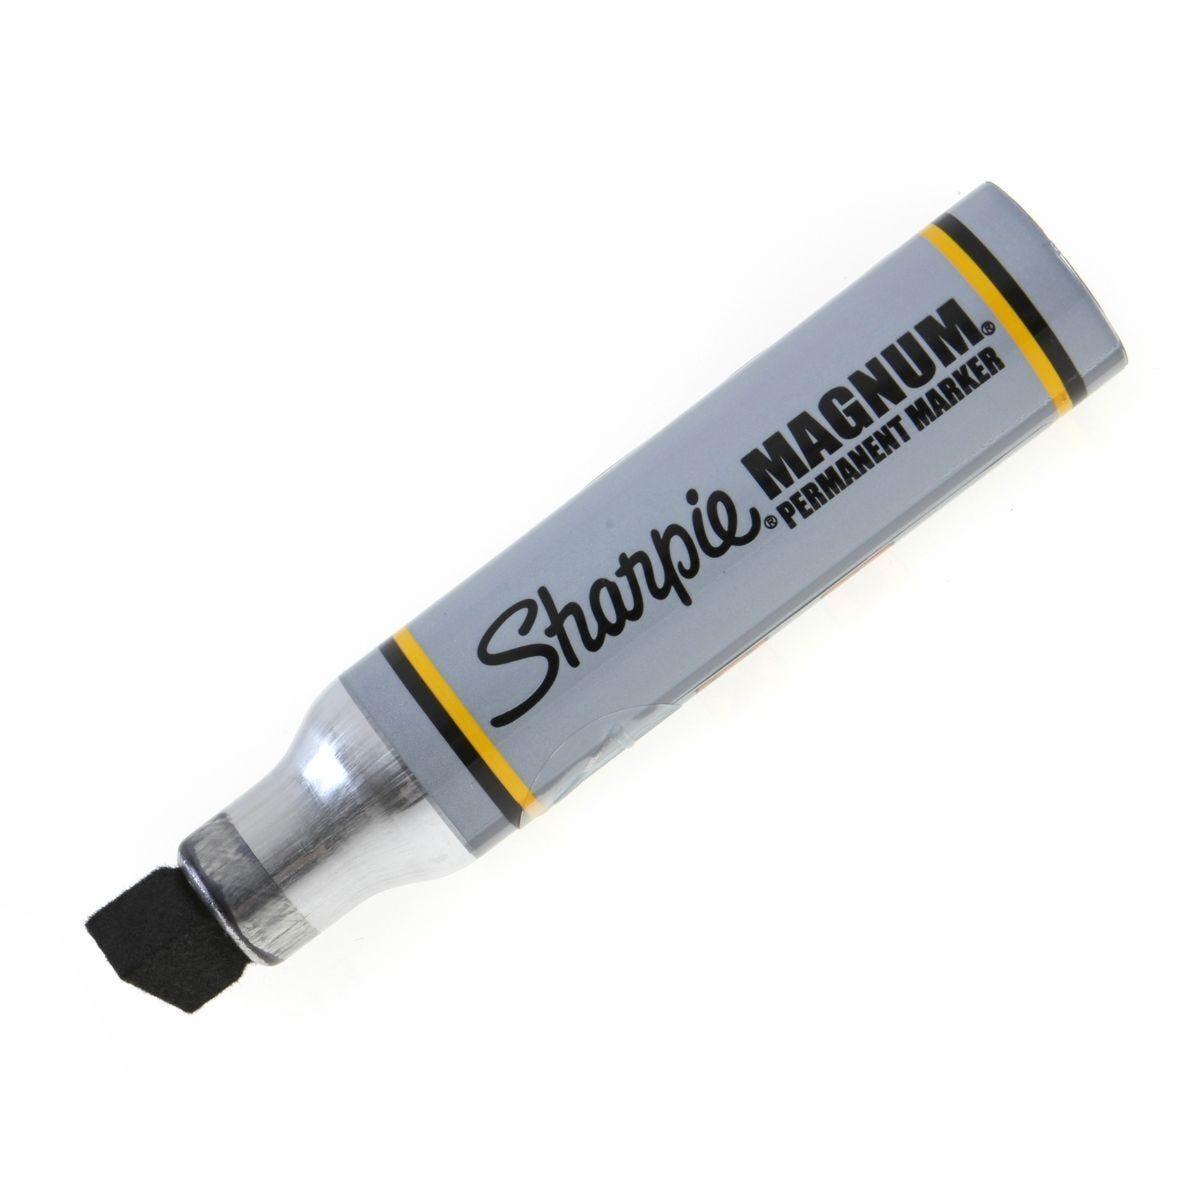 Sharpie Magnum Marker Pen Permanent Chisel Tip